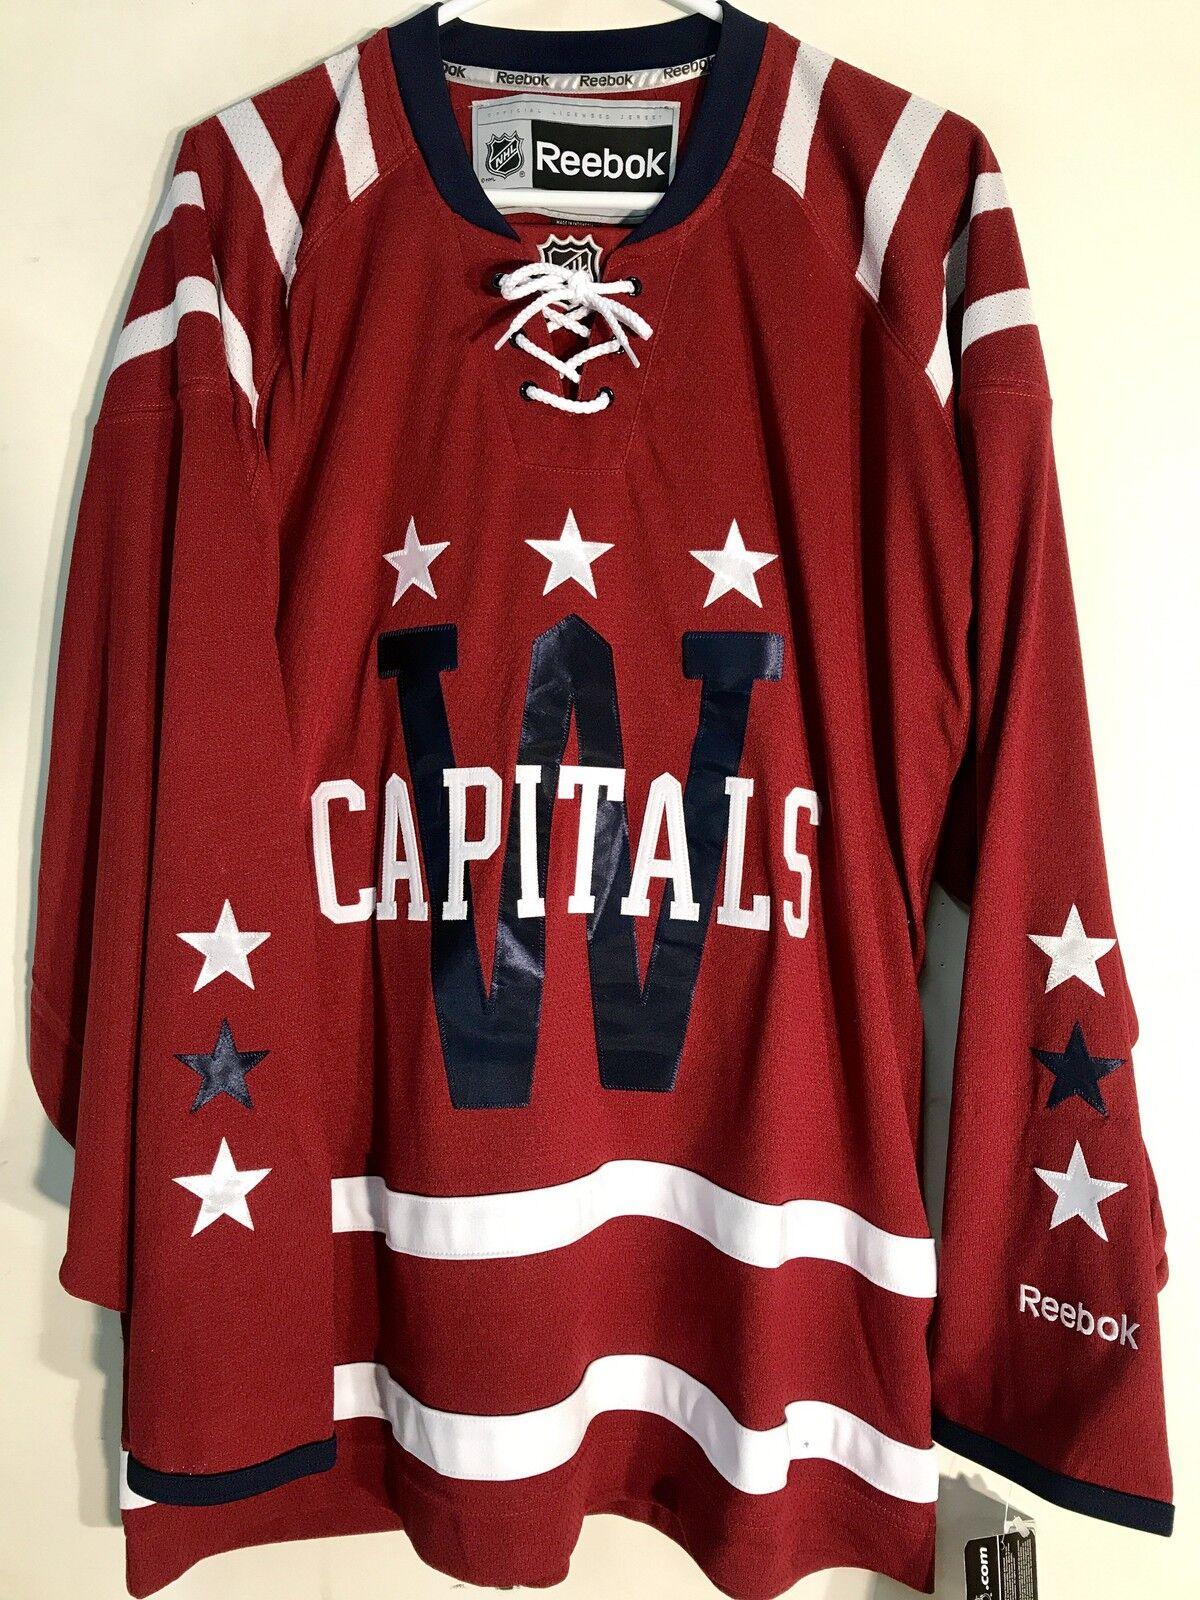 on sale 77dd3 731e6 Reebok Premier NHL Jersey Washington Capitals Team Burgundy Winter Classic  sz S